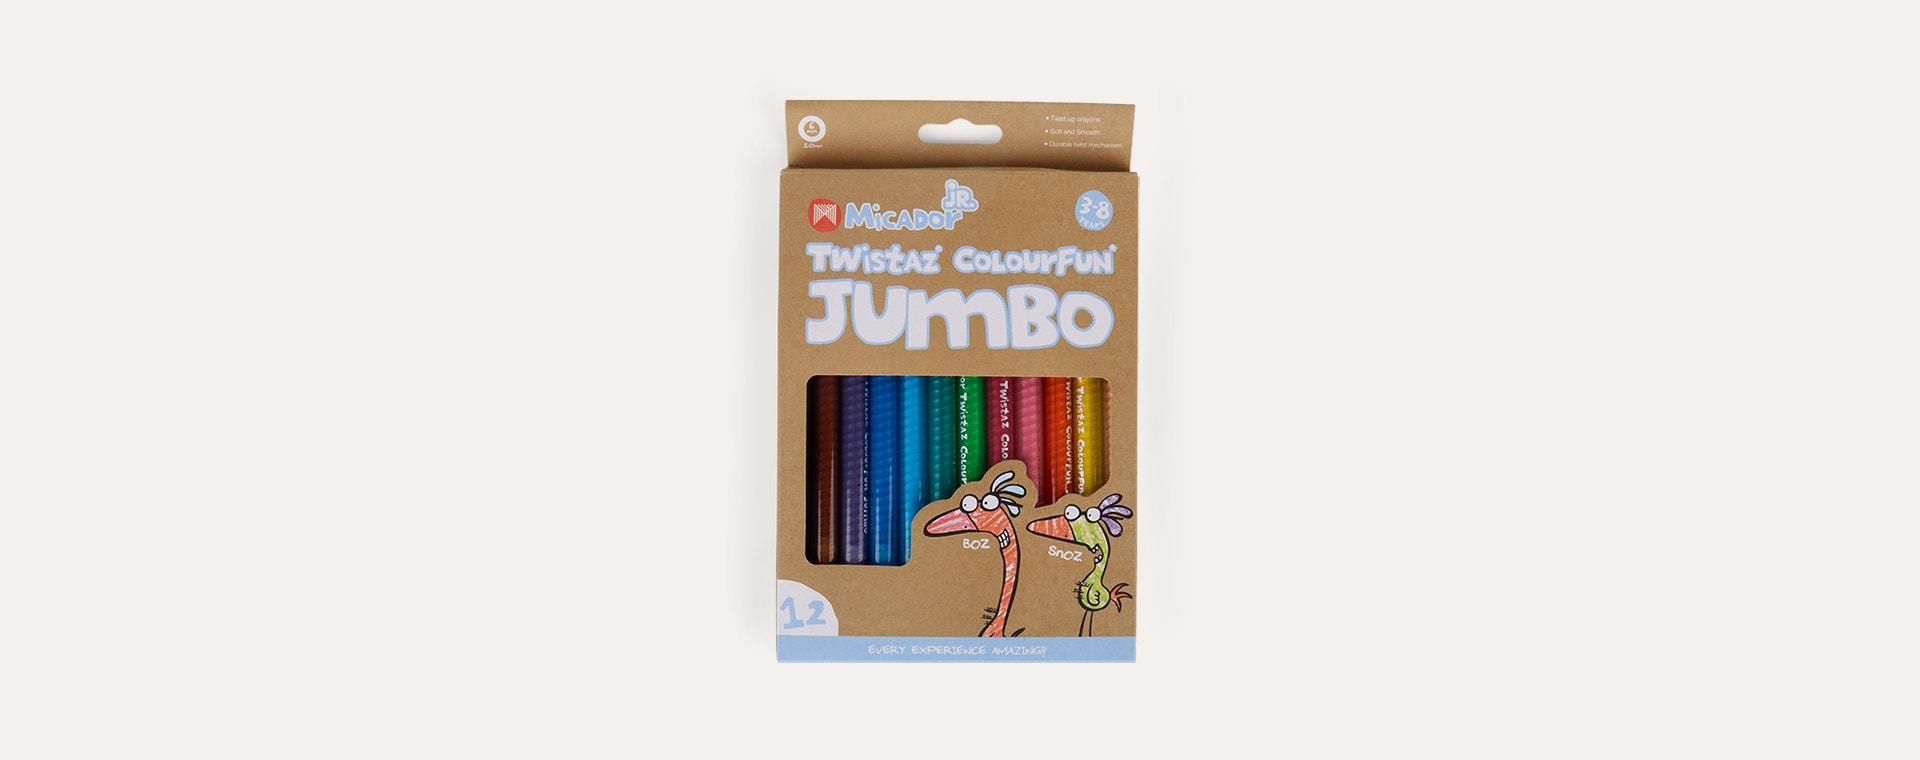 Multi Micador Micador Junior Twistaz Jumbo Crayons 12 Pack